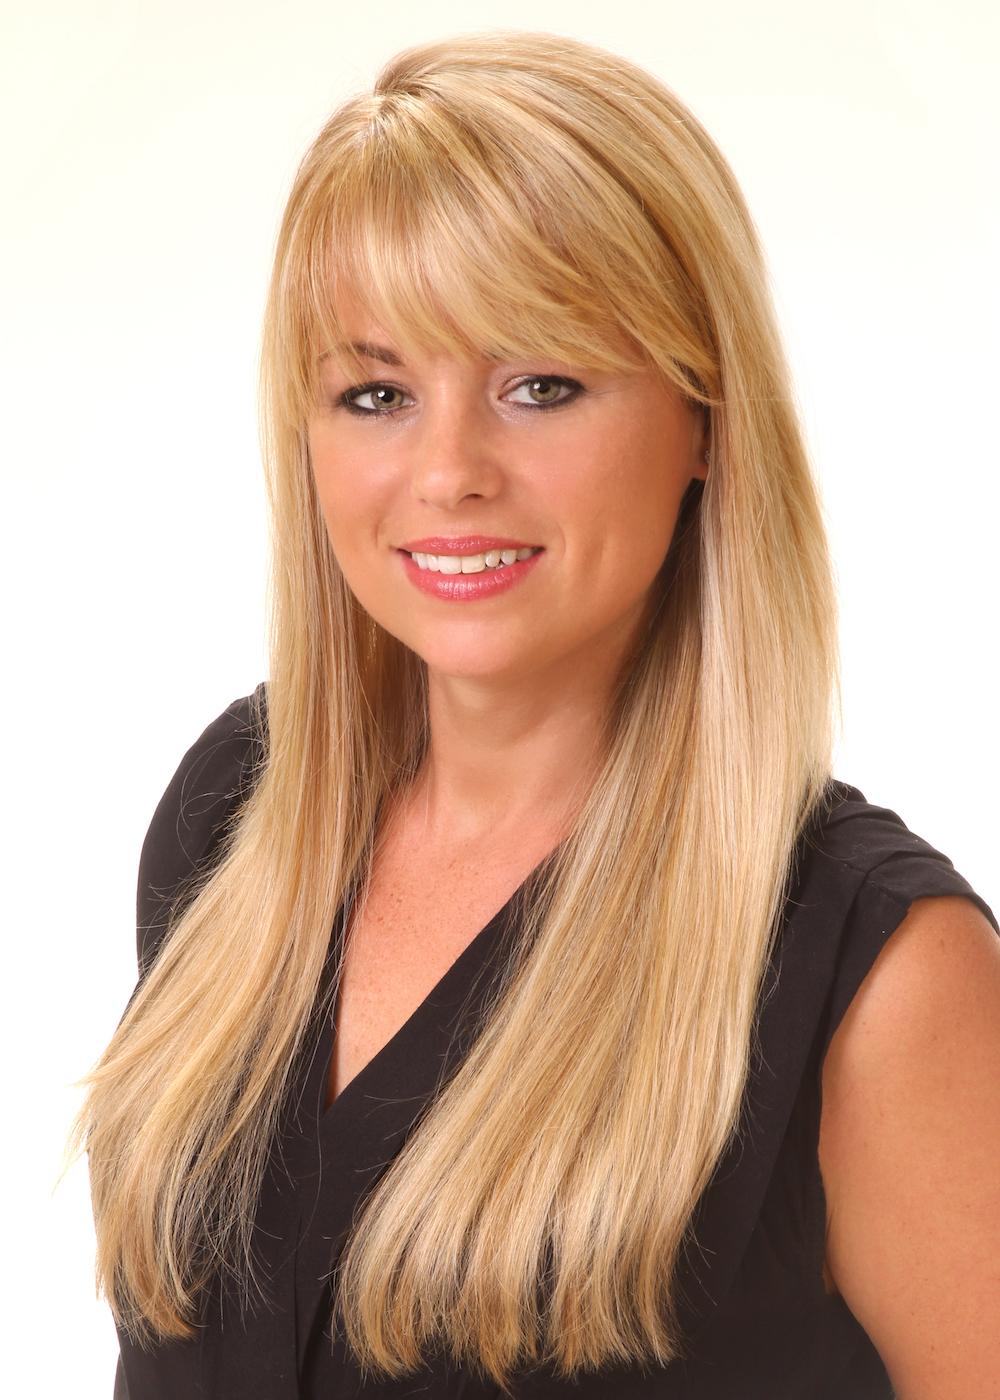 Tiffany Pedone